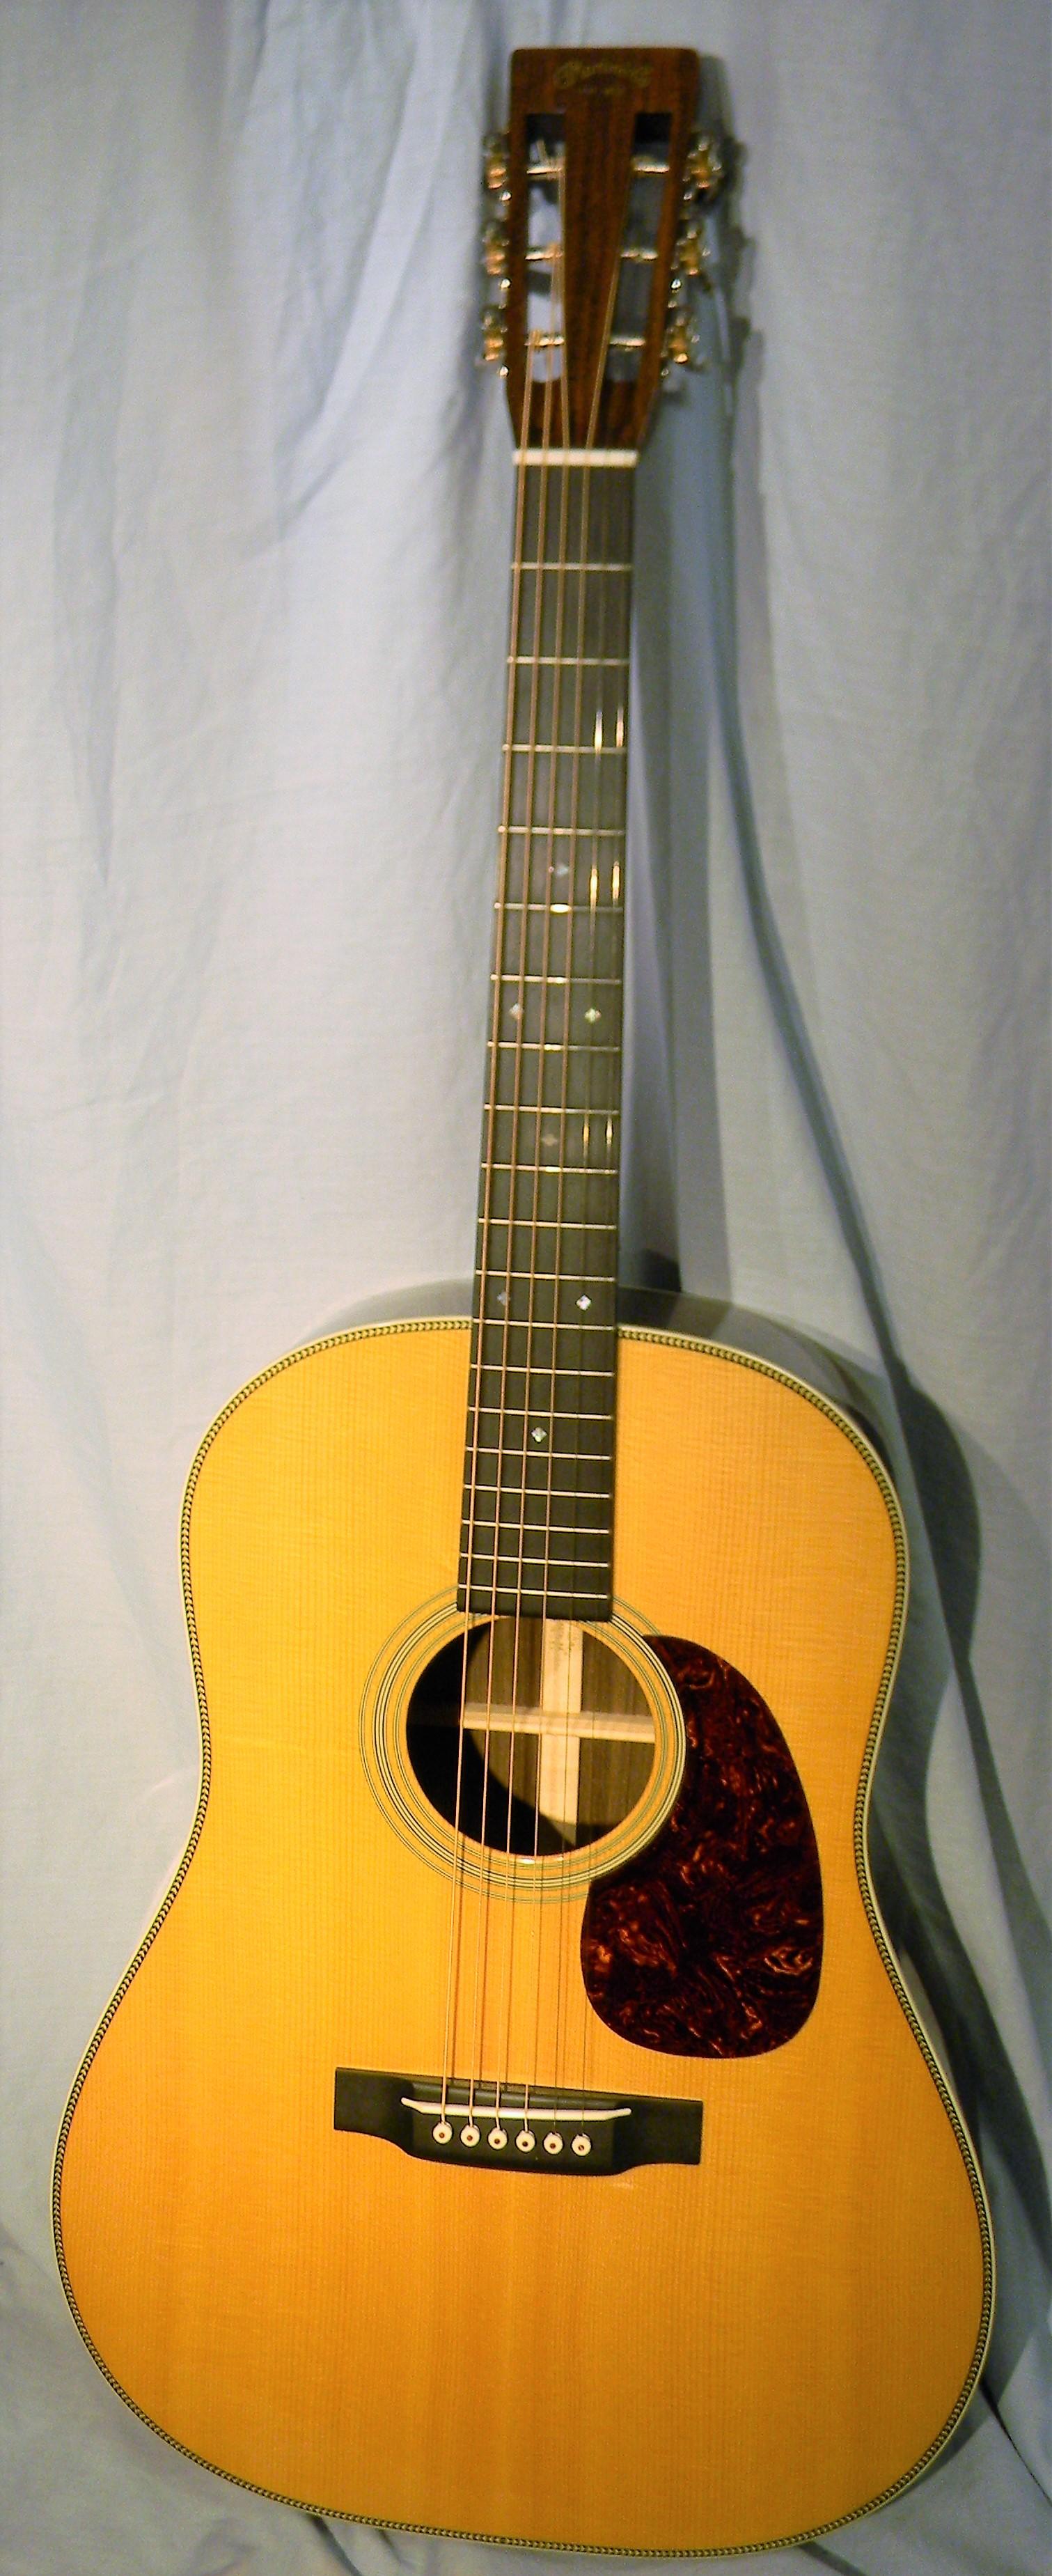 dscn5233 san antonio guitar store guitar tex. Black Bedroom Furniture Sets. Home Design Ideas